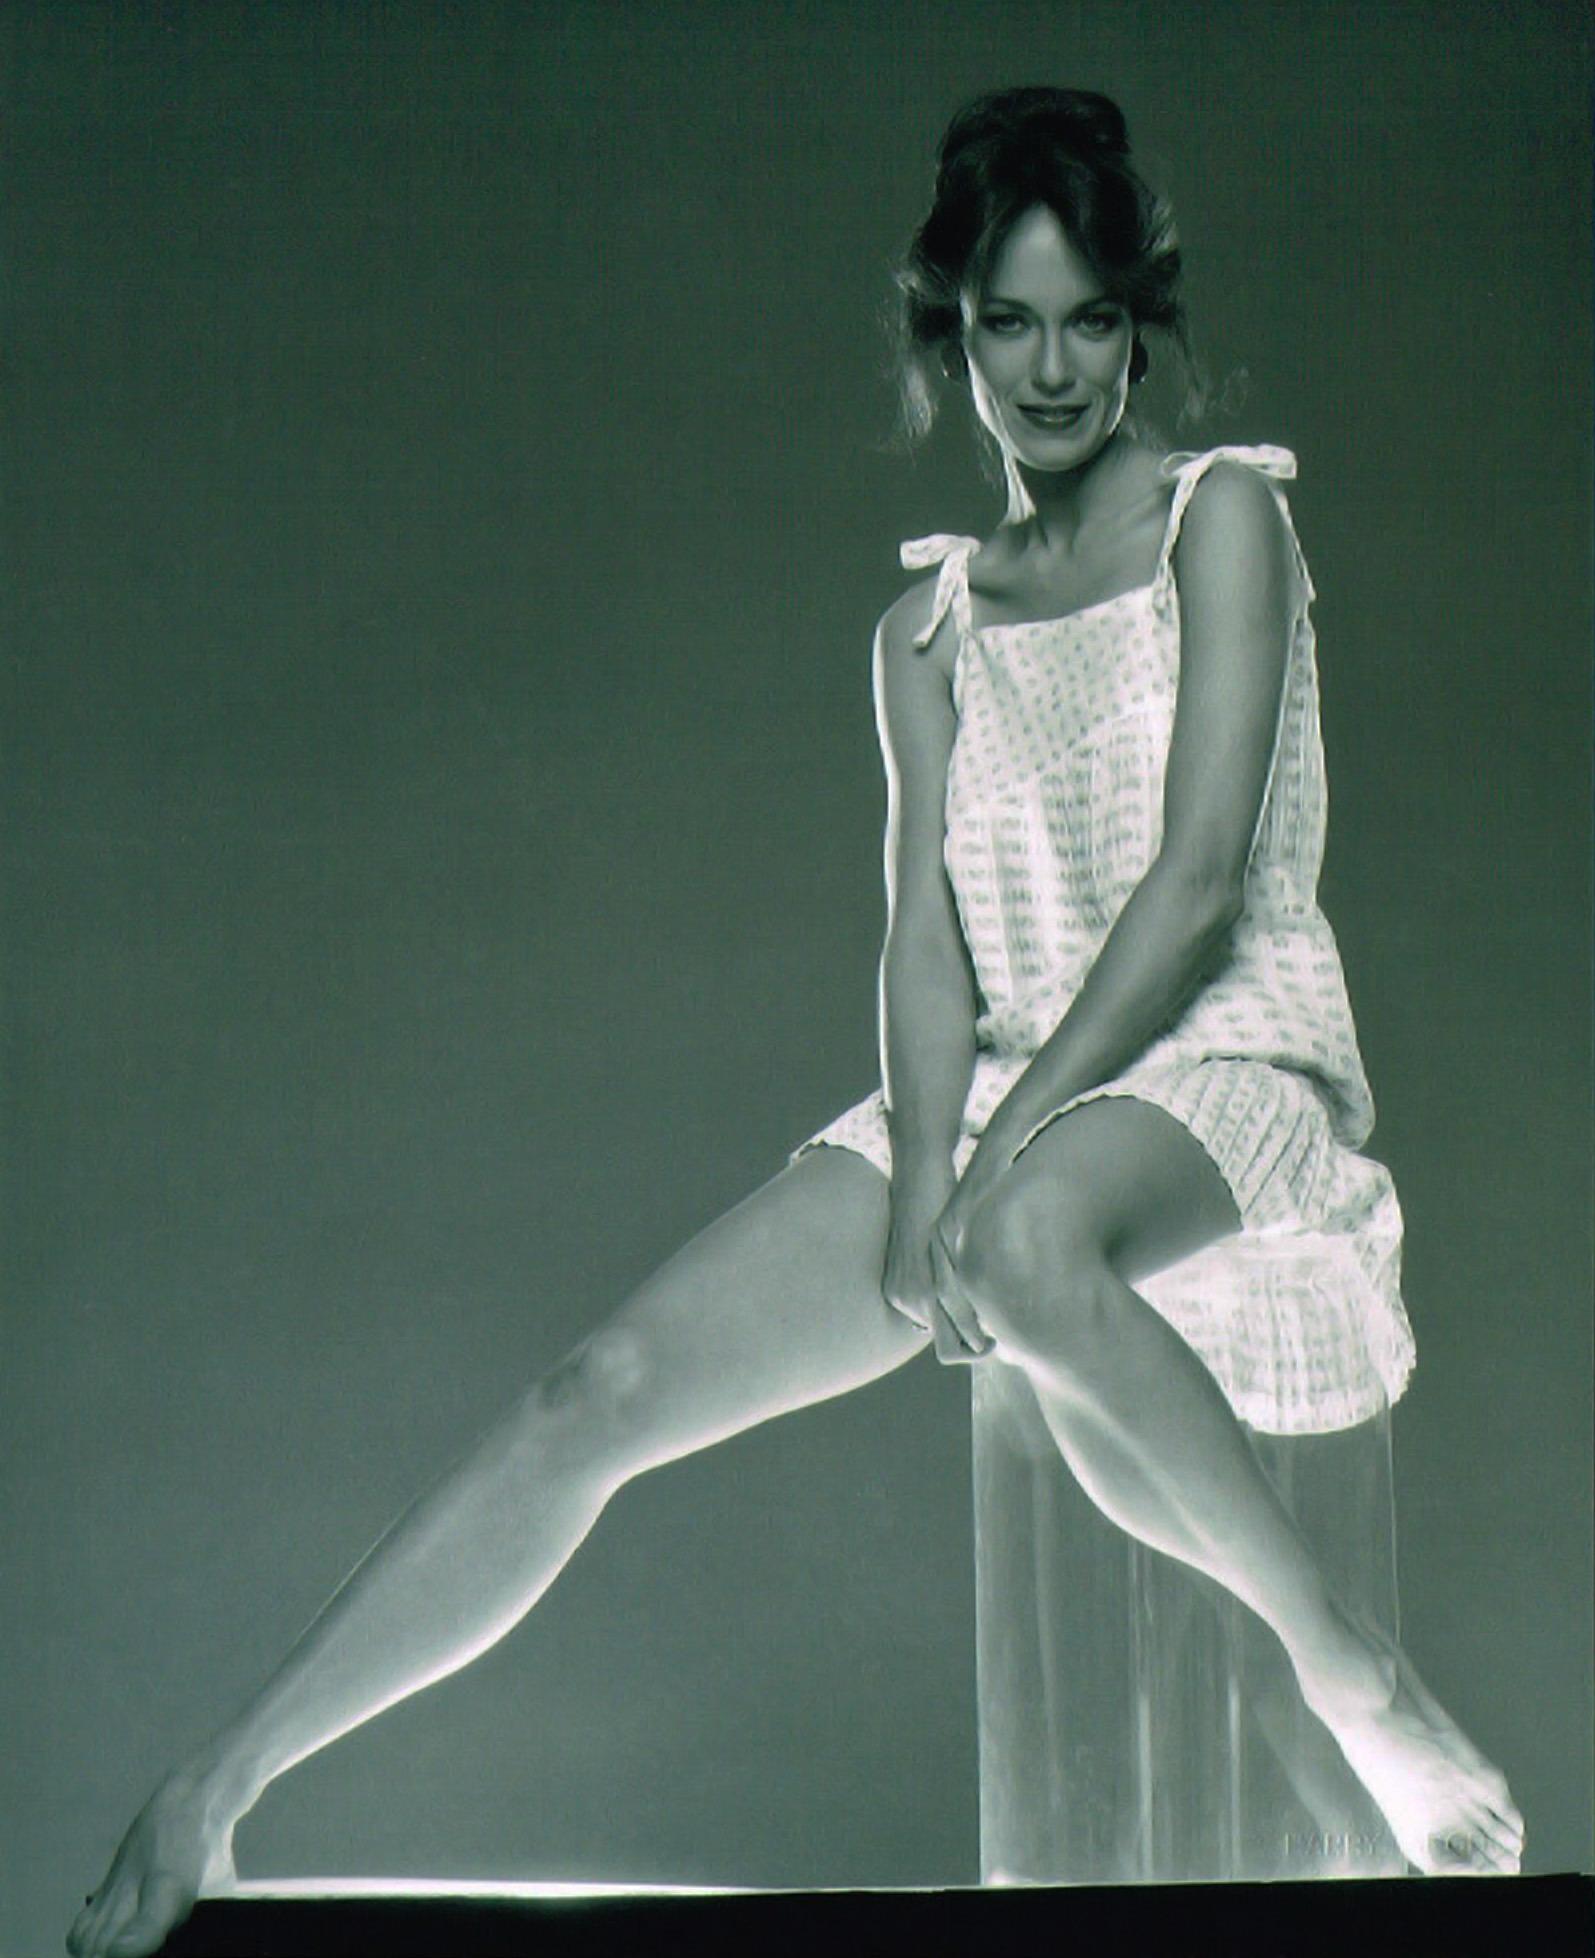 Catherine bach sexy leg photo